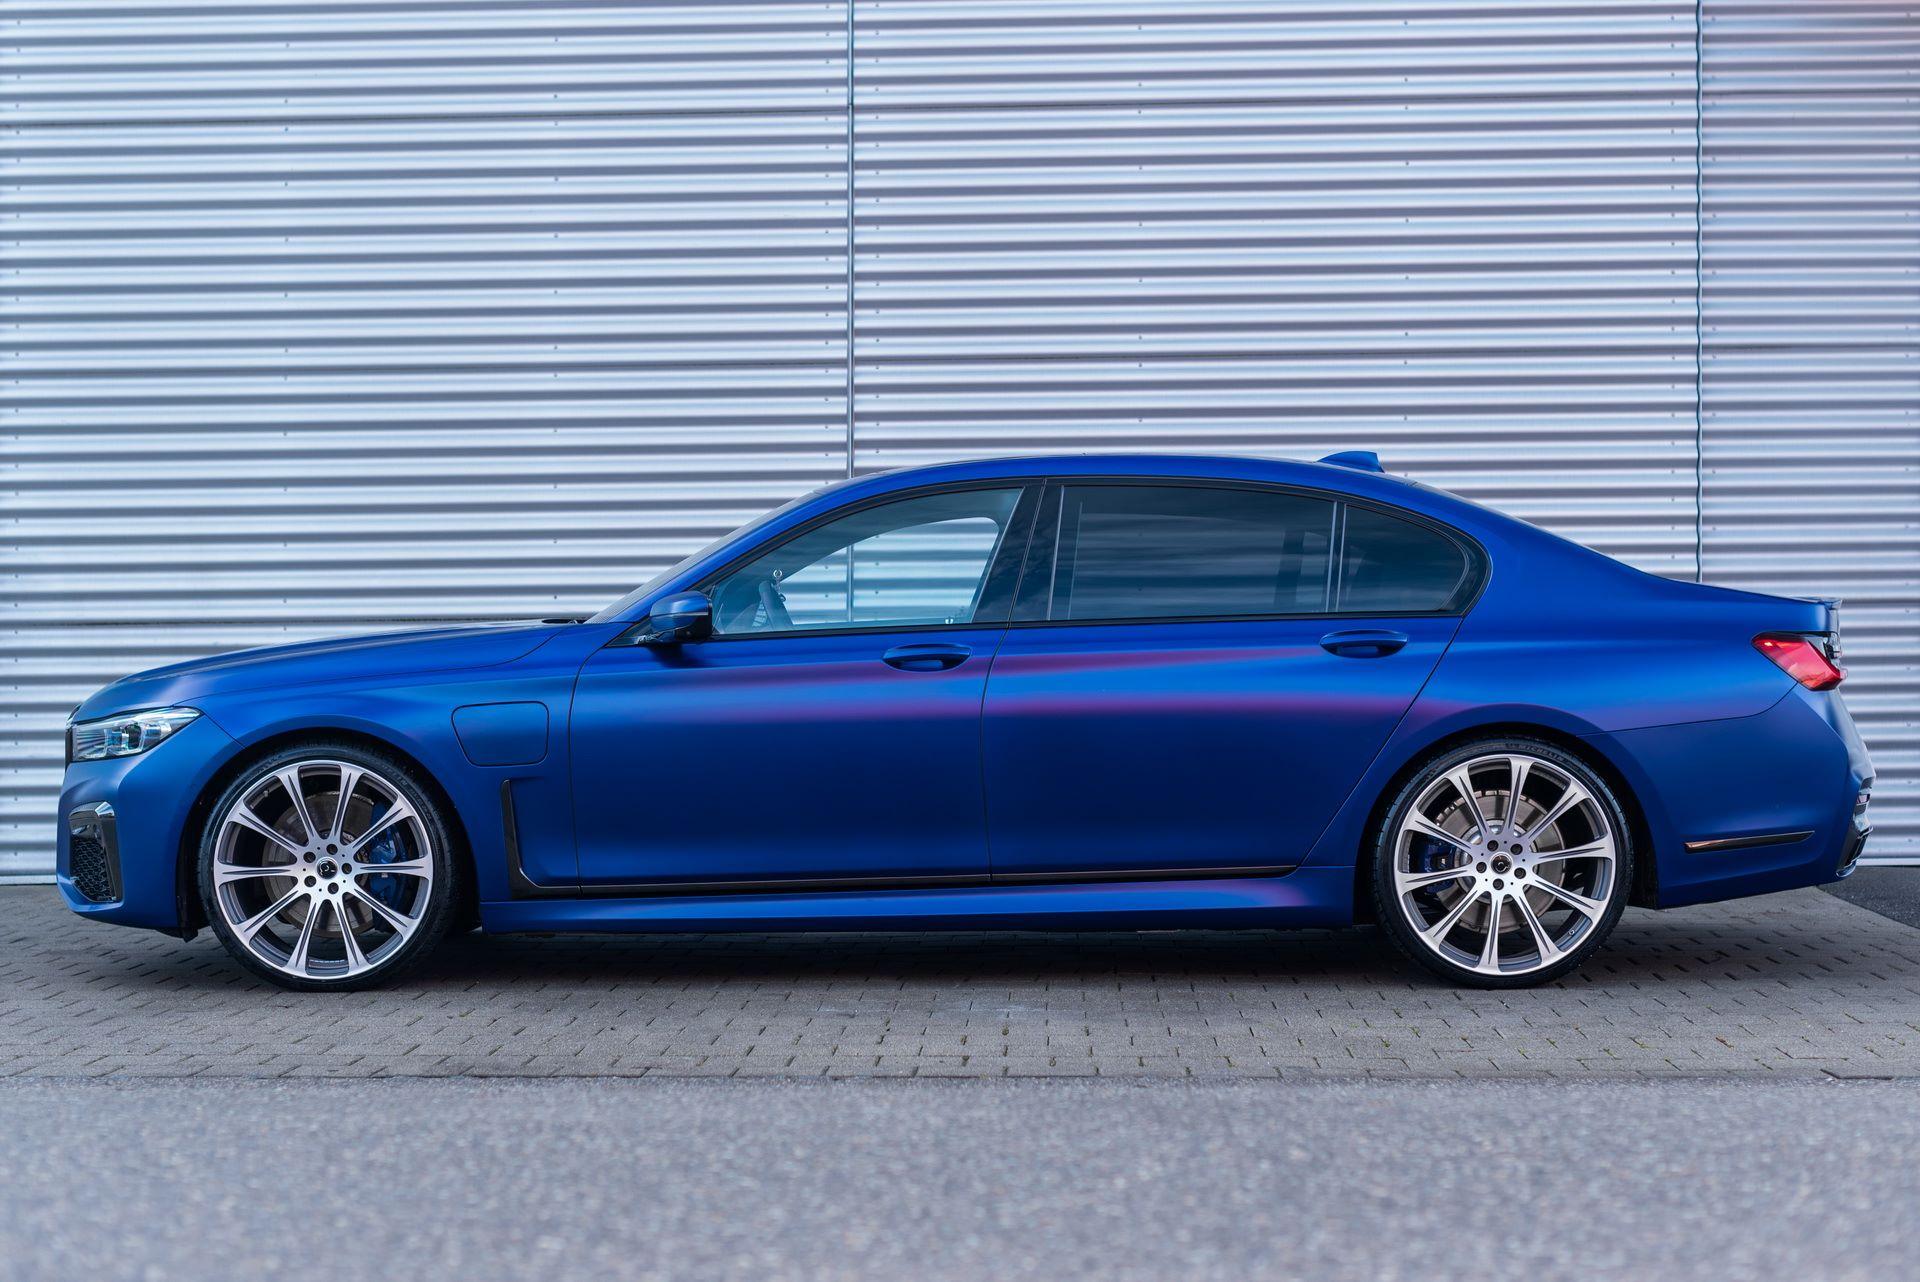 BMW-745Le-xDrive-by-Dahler-5